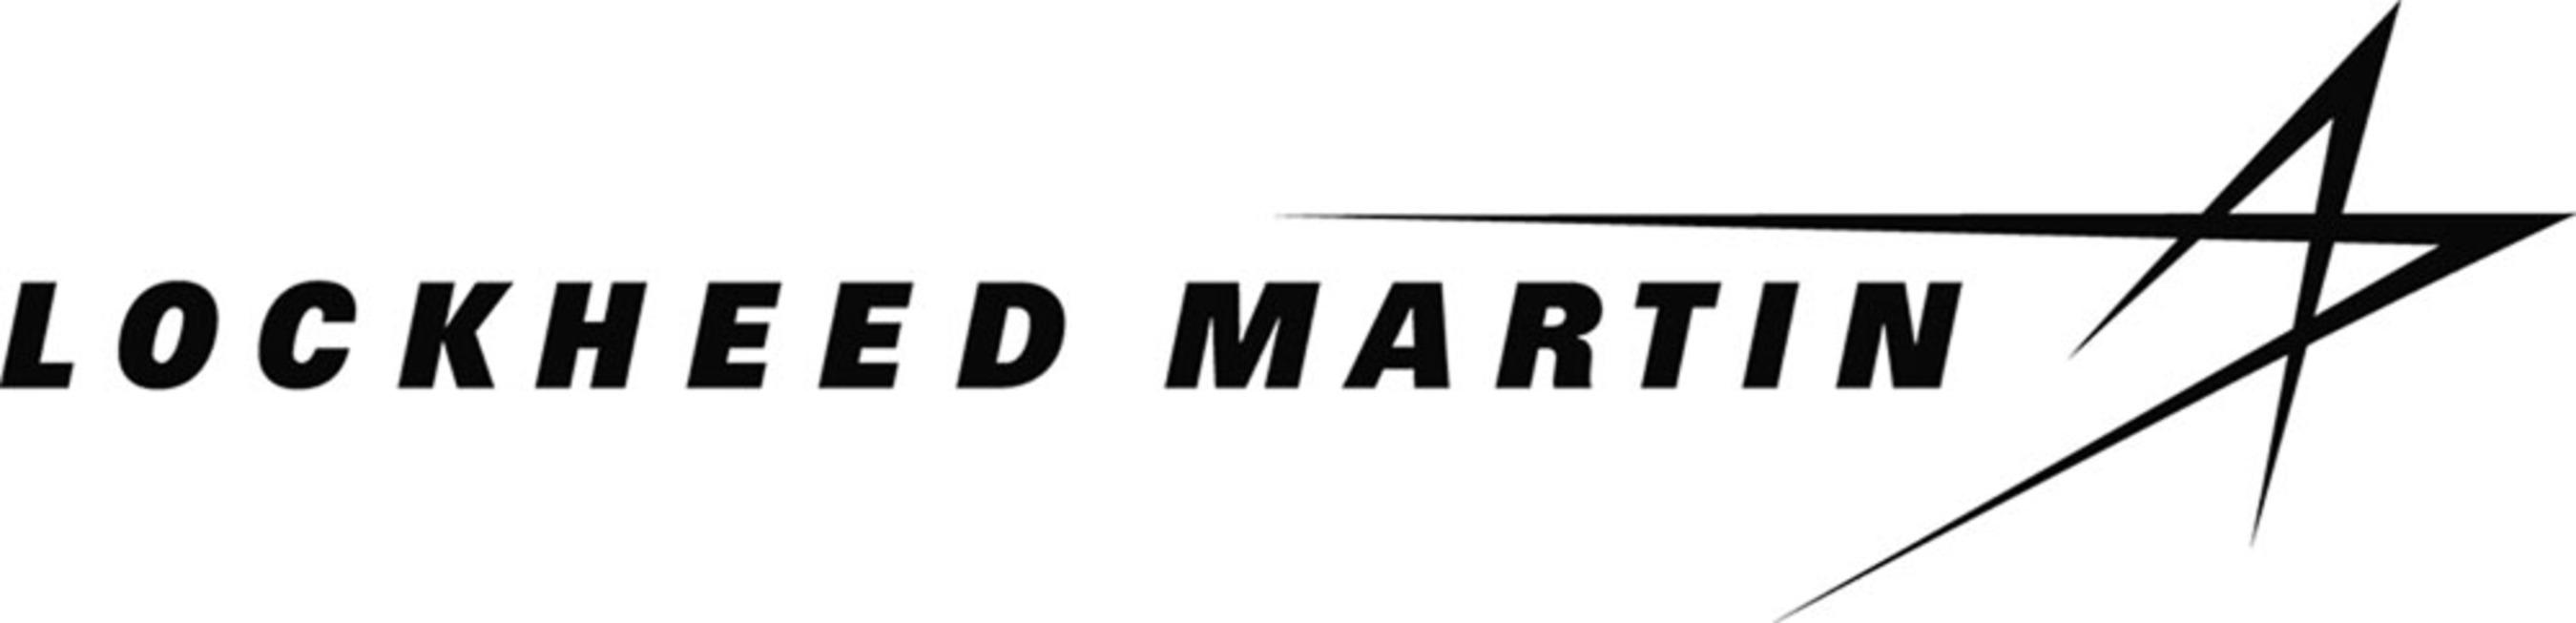 Lockheed Martin Corporation. (PRNewsFoto/Lockheed Martin)